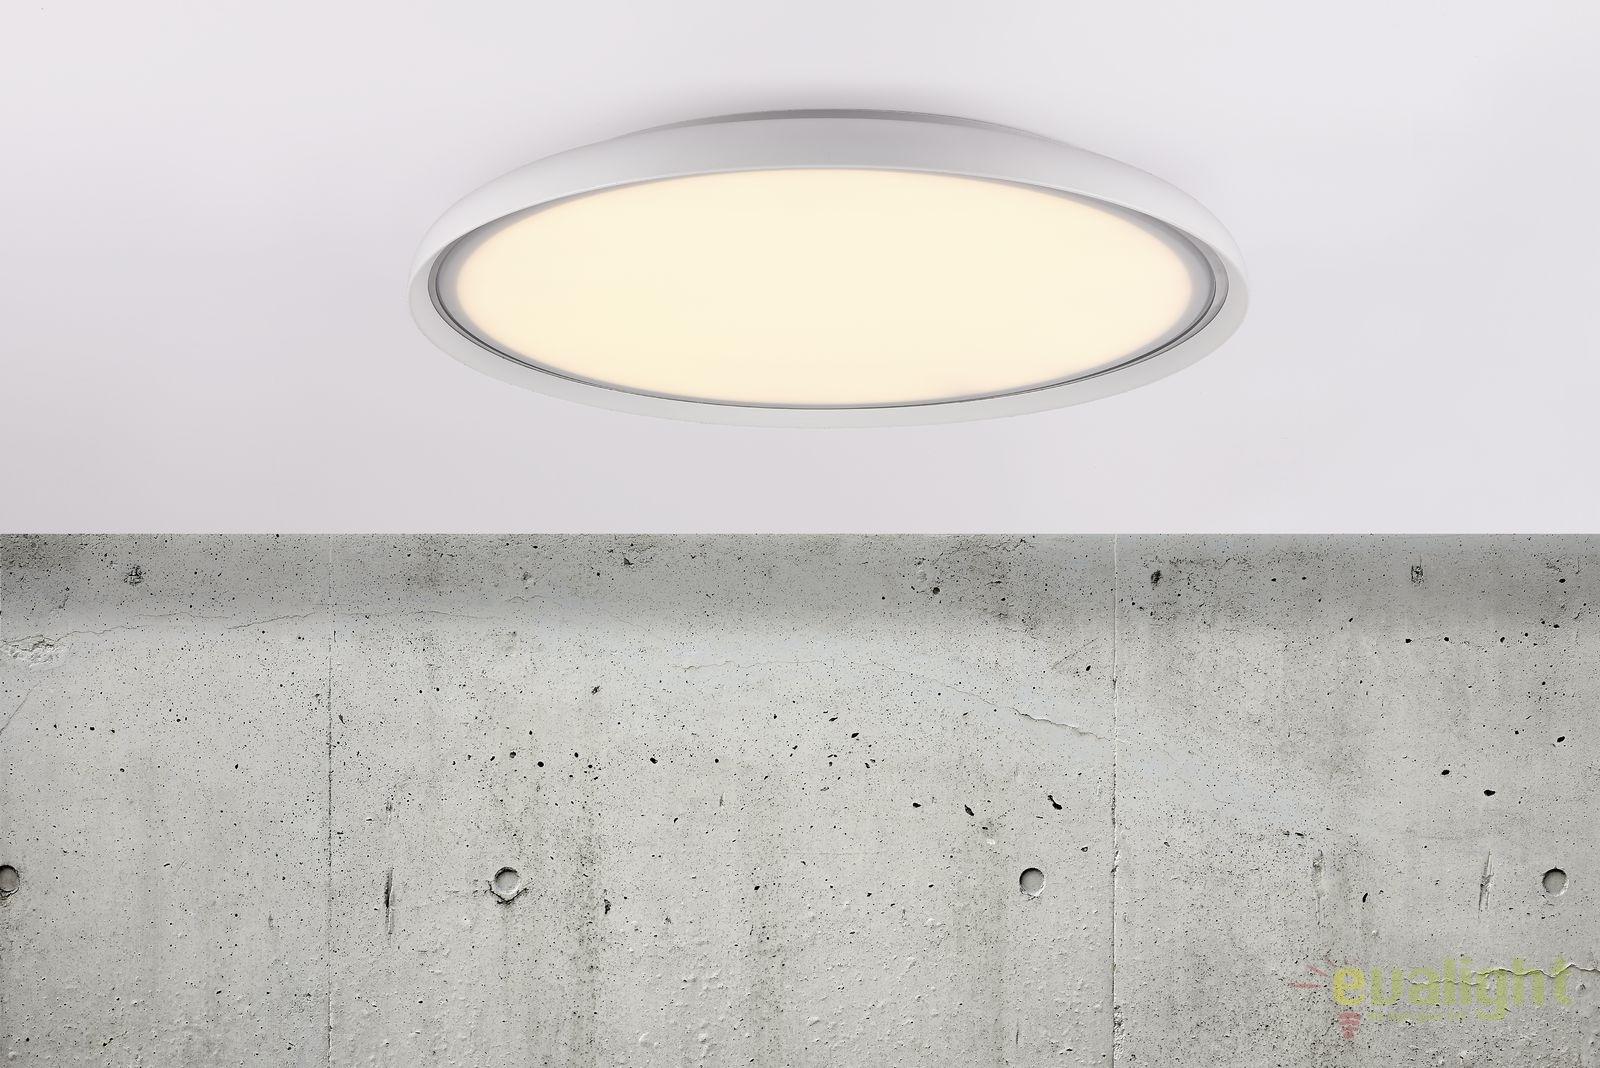 Plafoniere Led Moderne : Plafoniera led design modern diam cm la luna dftp